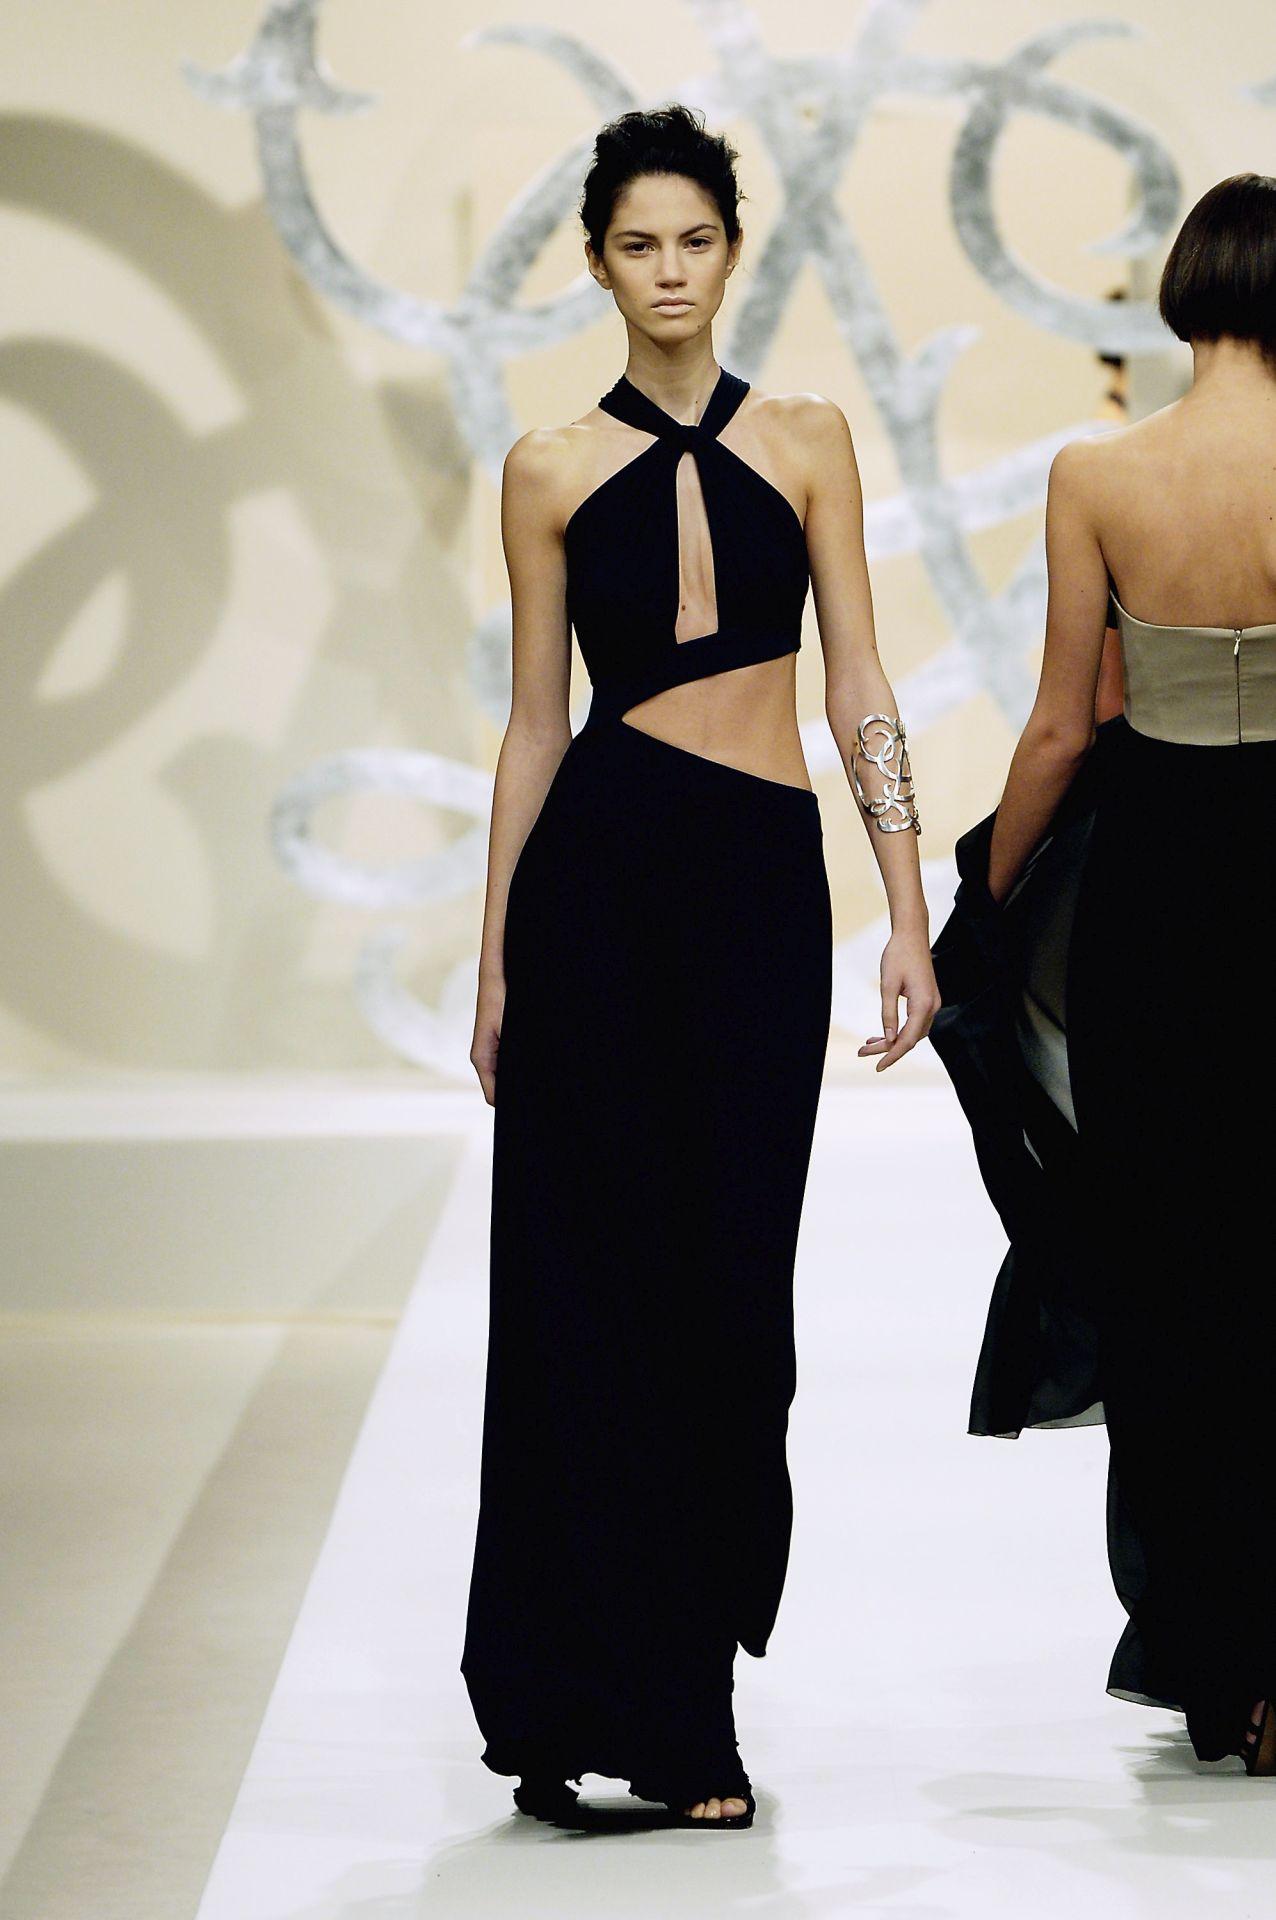 4. kép: Cutout ruha - Guy Laroche 1997 (Fotó: Karl Prouse/Catwalking/Getty Images)